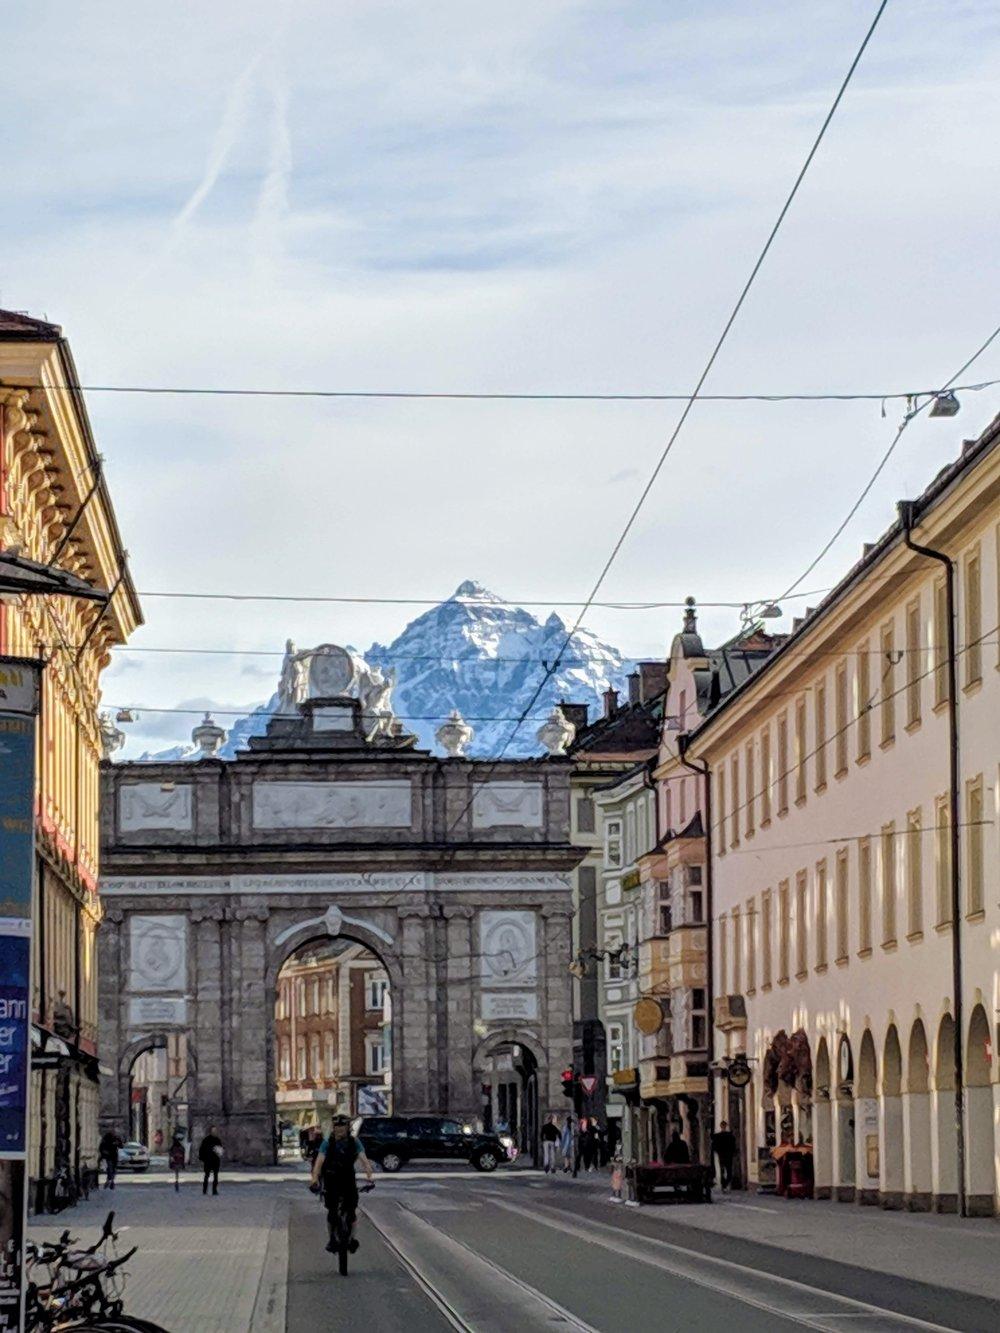 Triumphal Arch in Innsbruck Austria